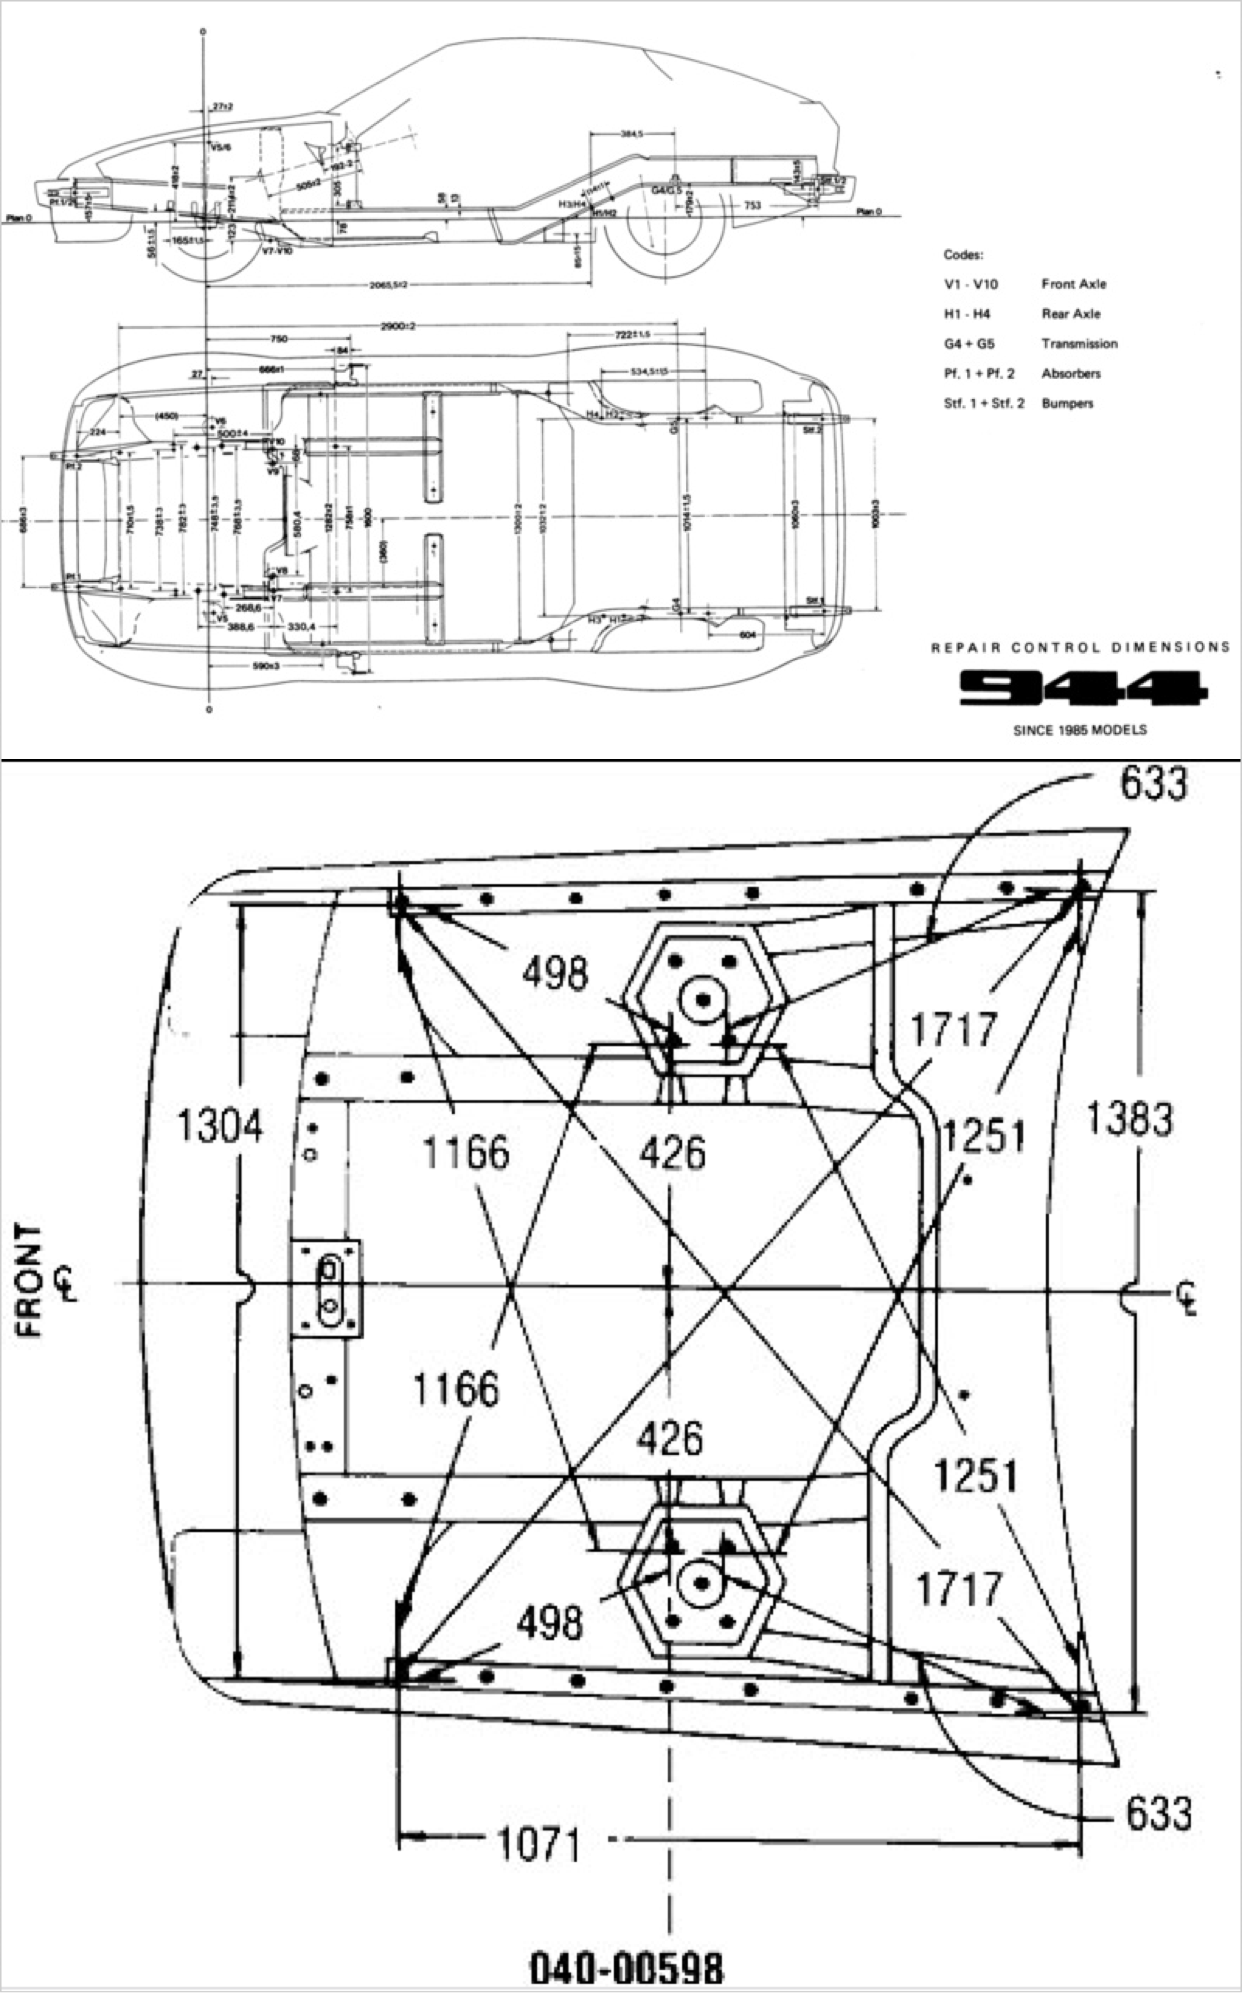 medium resolution of porsche 944 repair control dimensions front detail porsche porsche 911 engine diagram further porsche 924 transmission diagram